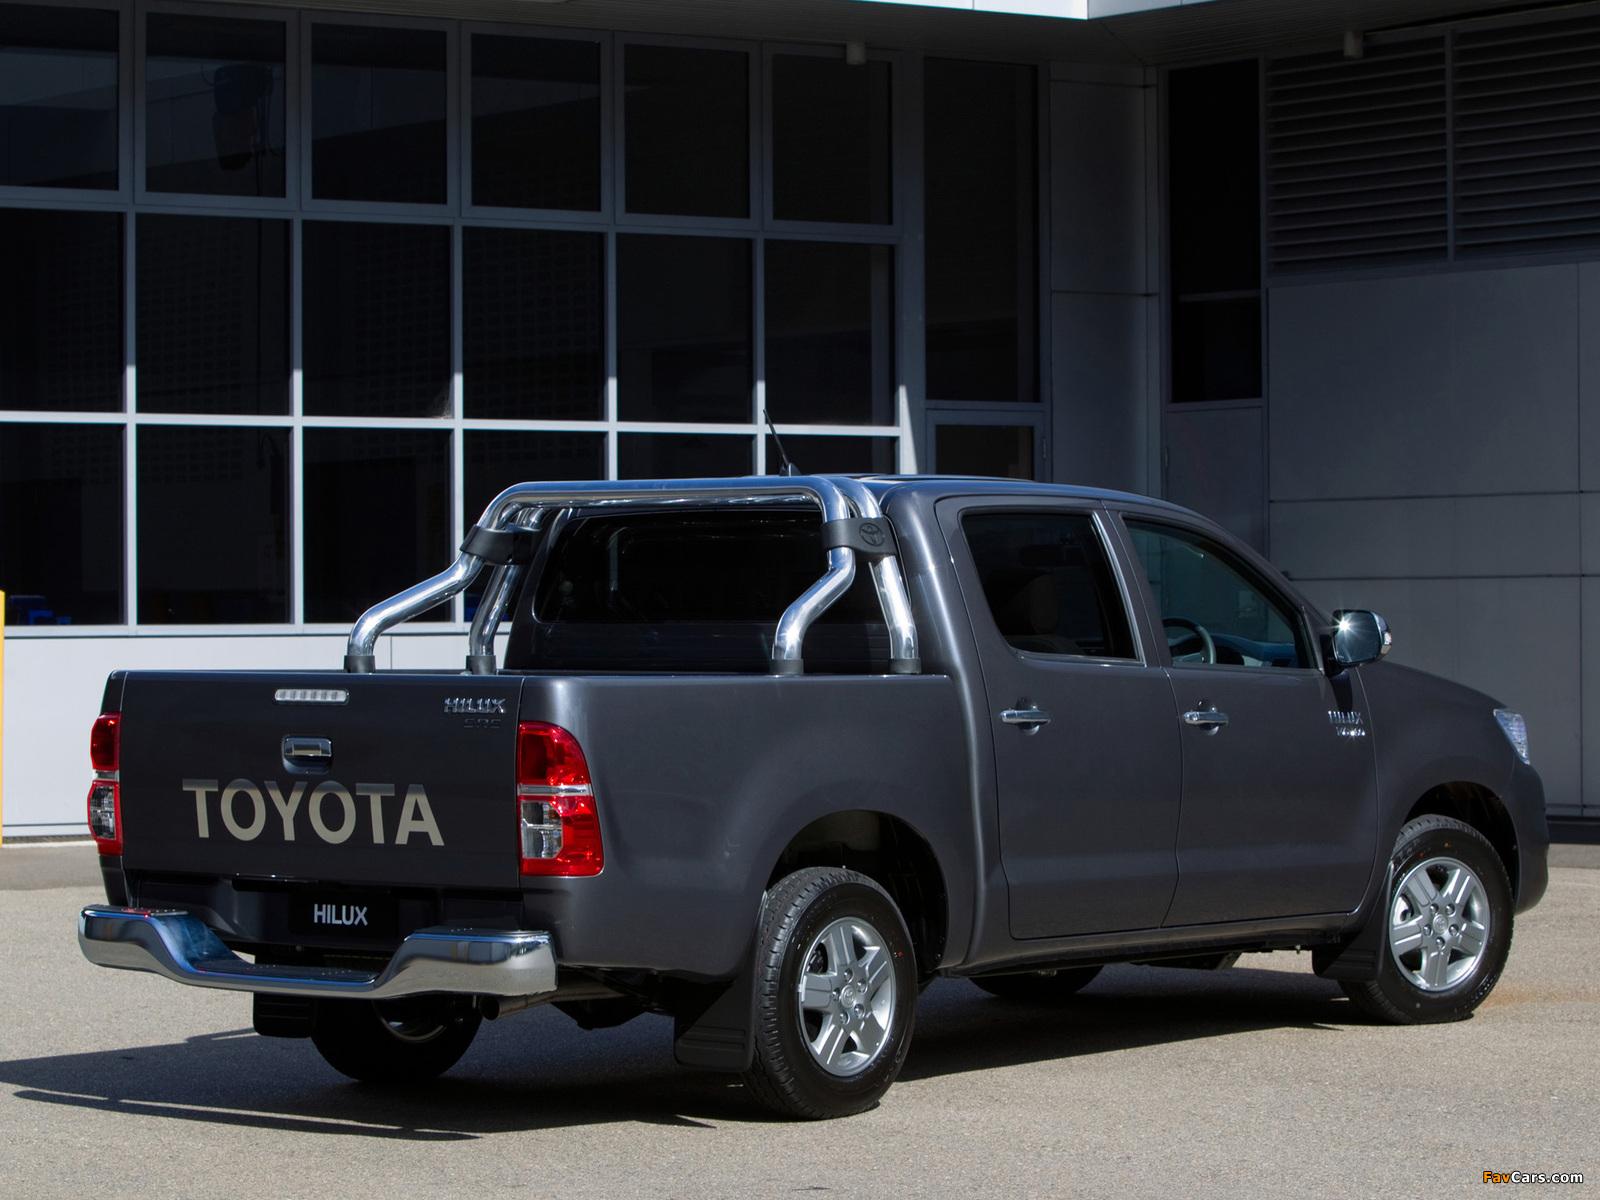 Hilux Tonka Truck | Concept Vehicle | Toyota Australia